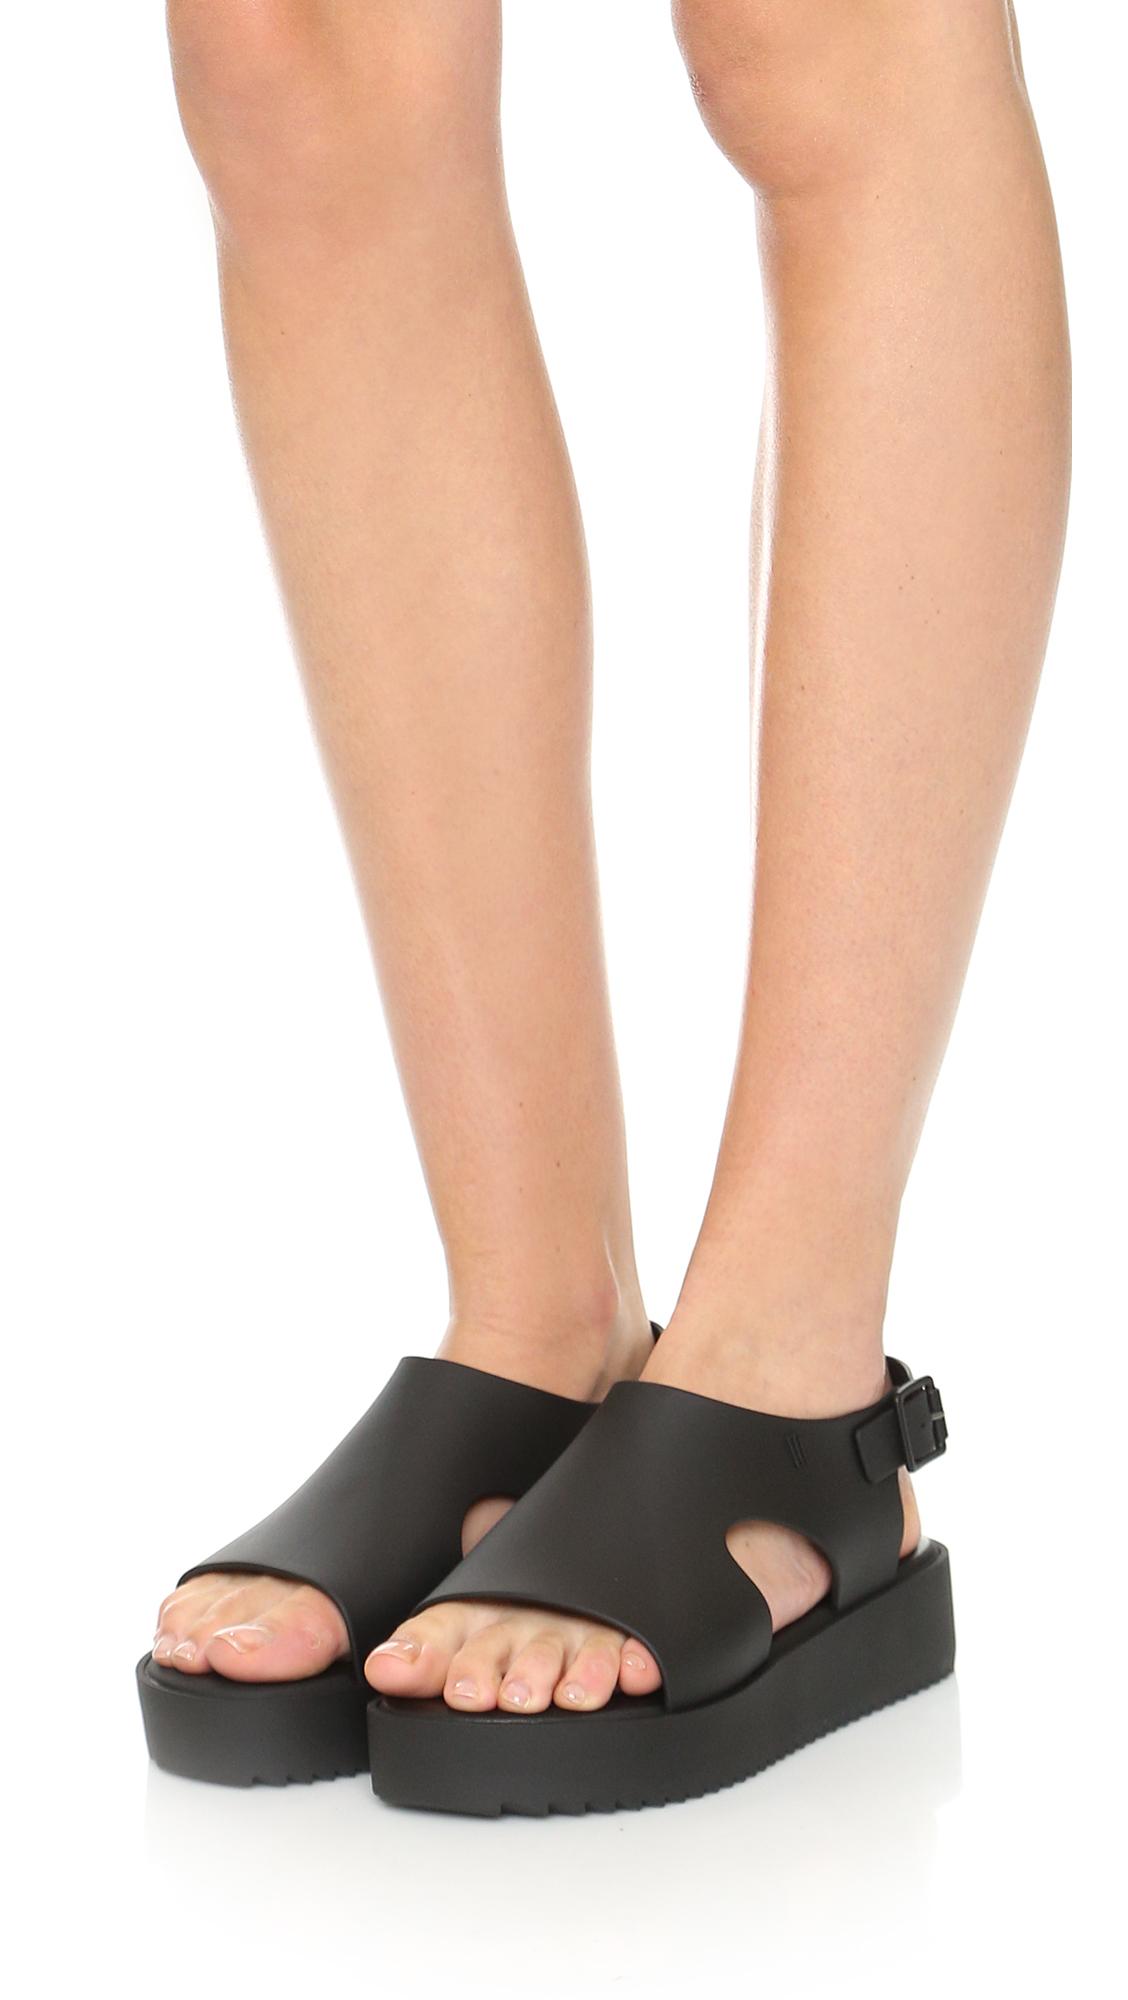 bcd59faa43 Melissa Hotness Flatform Sandals in Black - Lyst